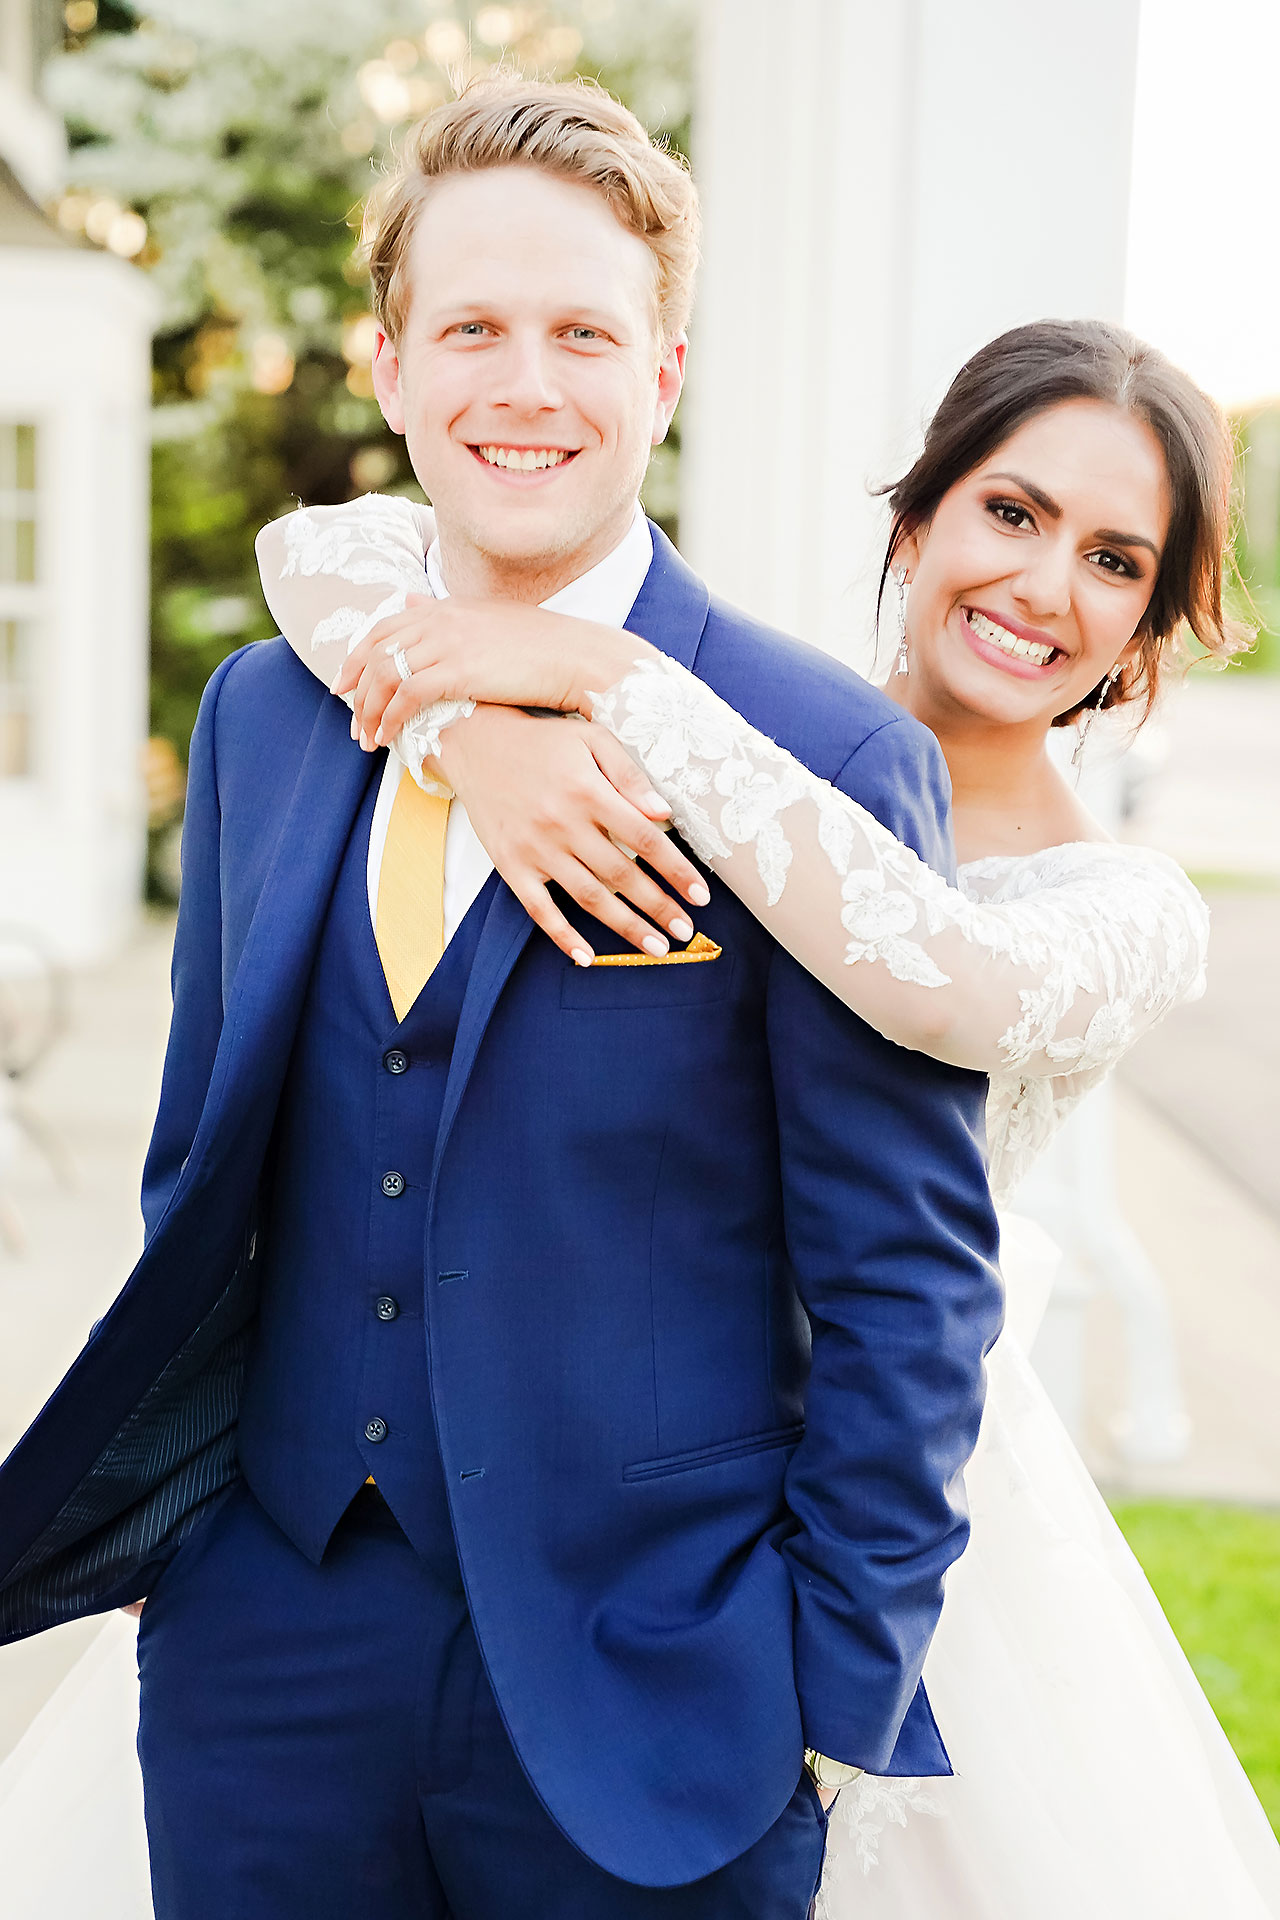 Nadia Parker Black Iris Estate Carmel Indiana Wedding May 2021 284